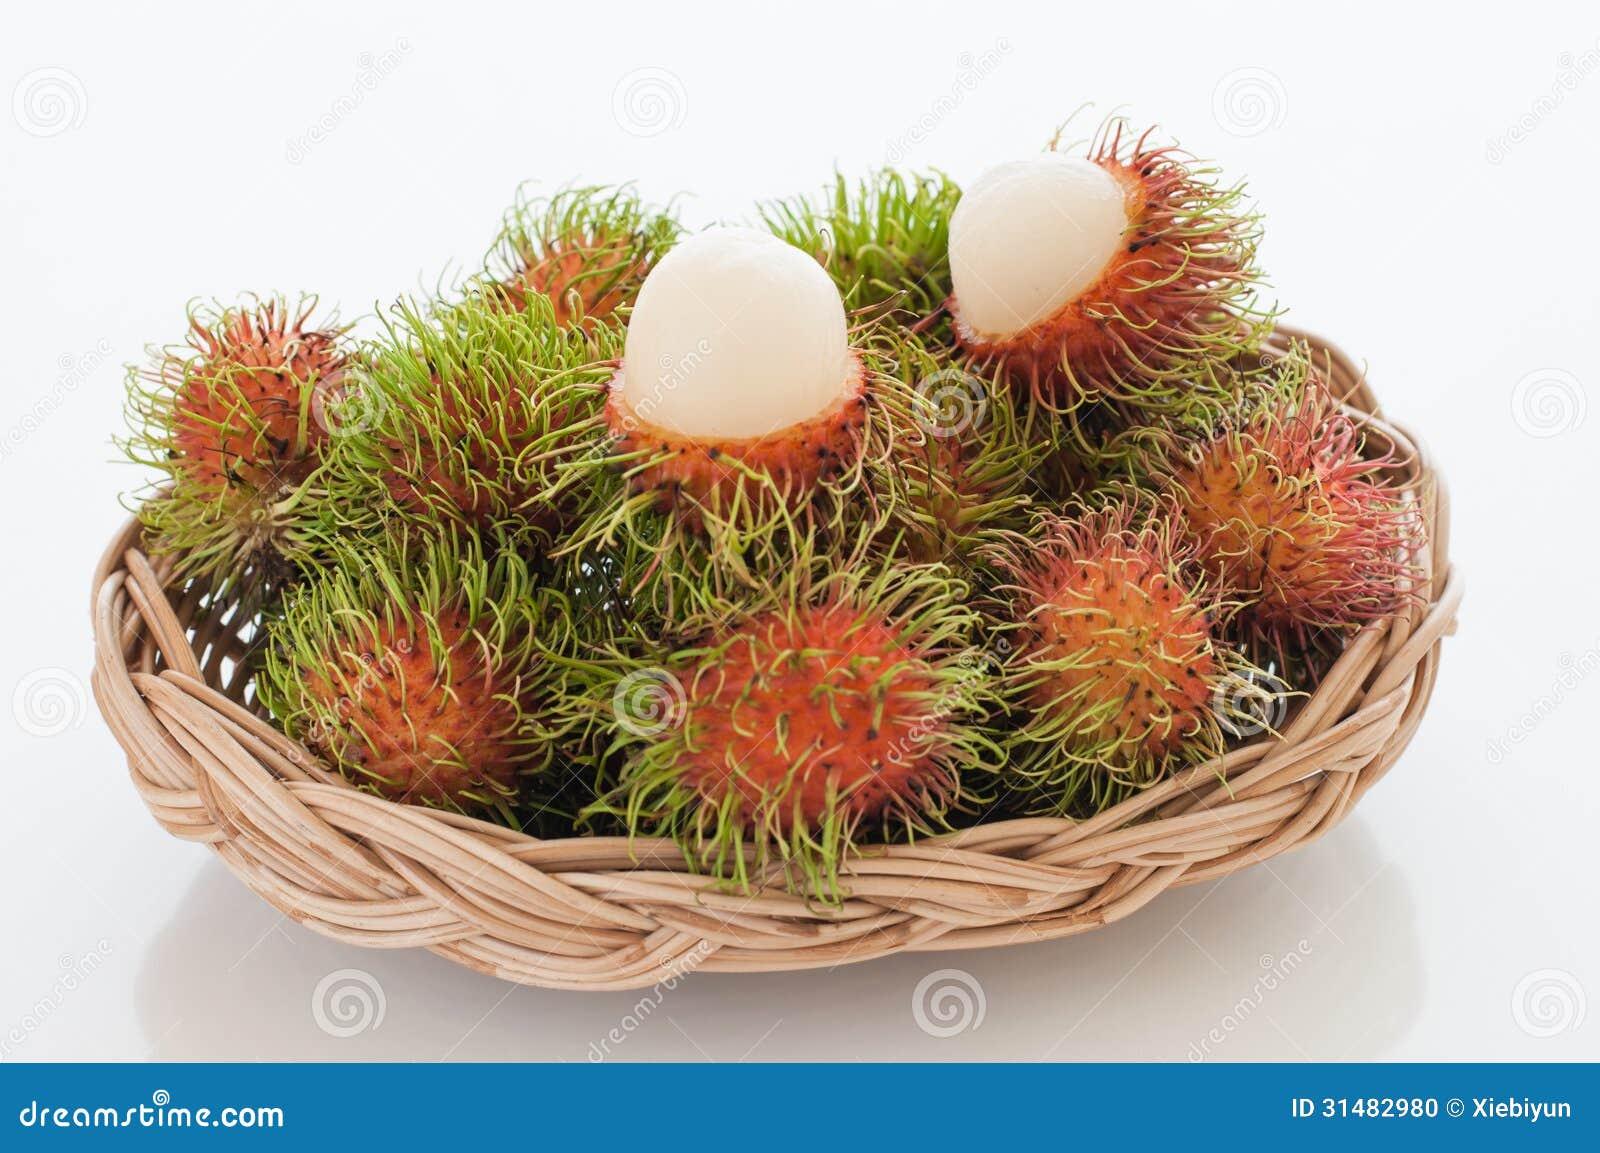 basket of red hairy rambutan fruits. stock photo - image of rambutan